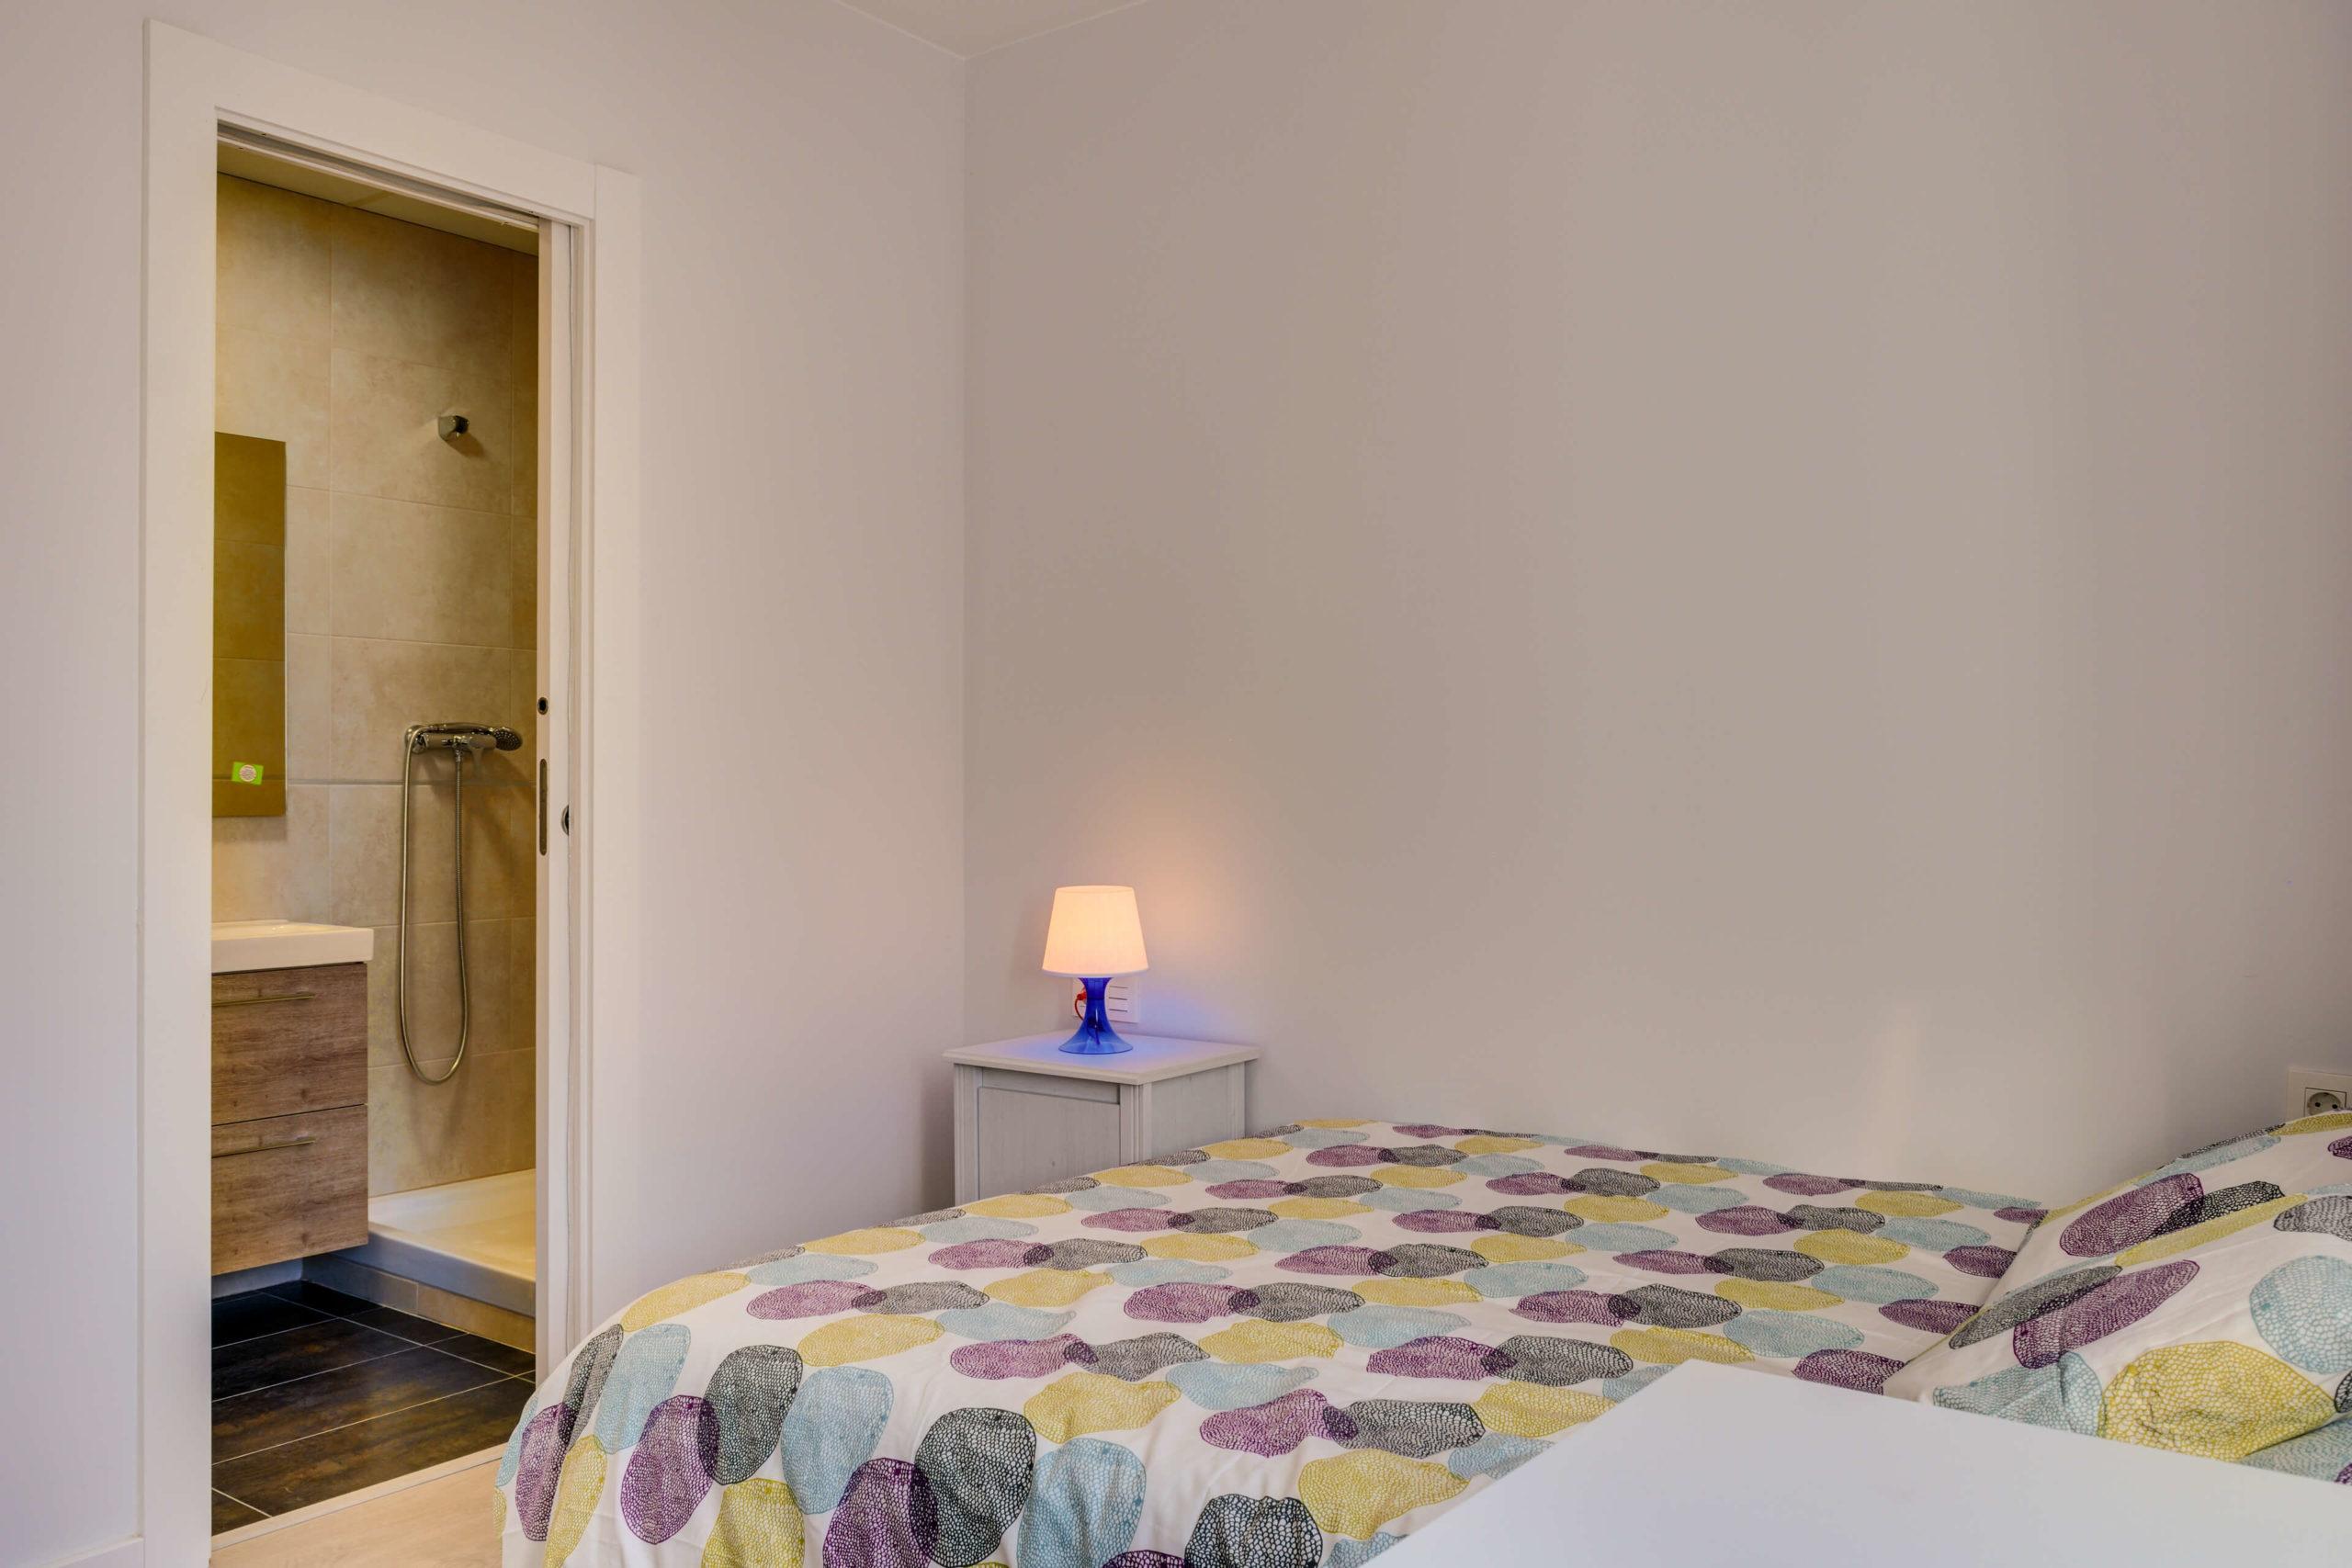 habitacion renovada alquiler baño privado piso compartido zaragoza